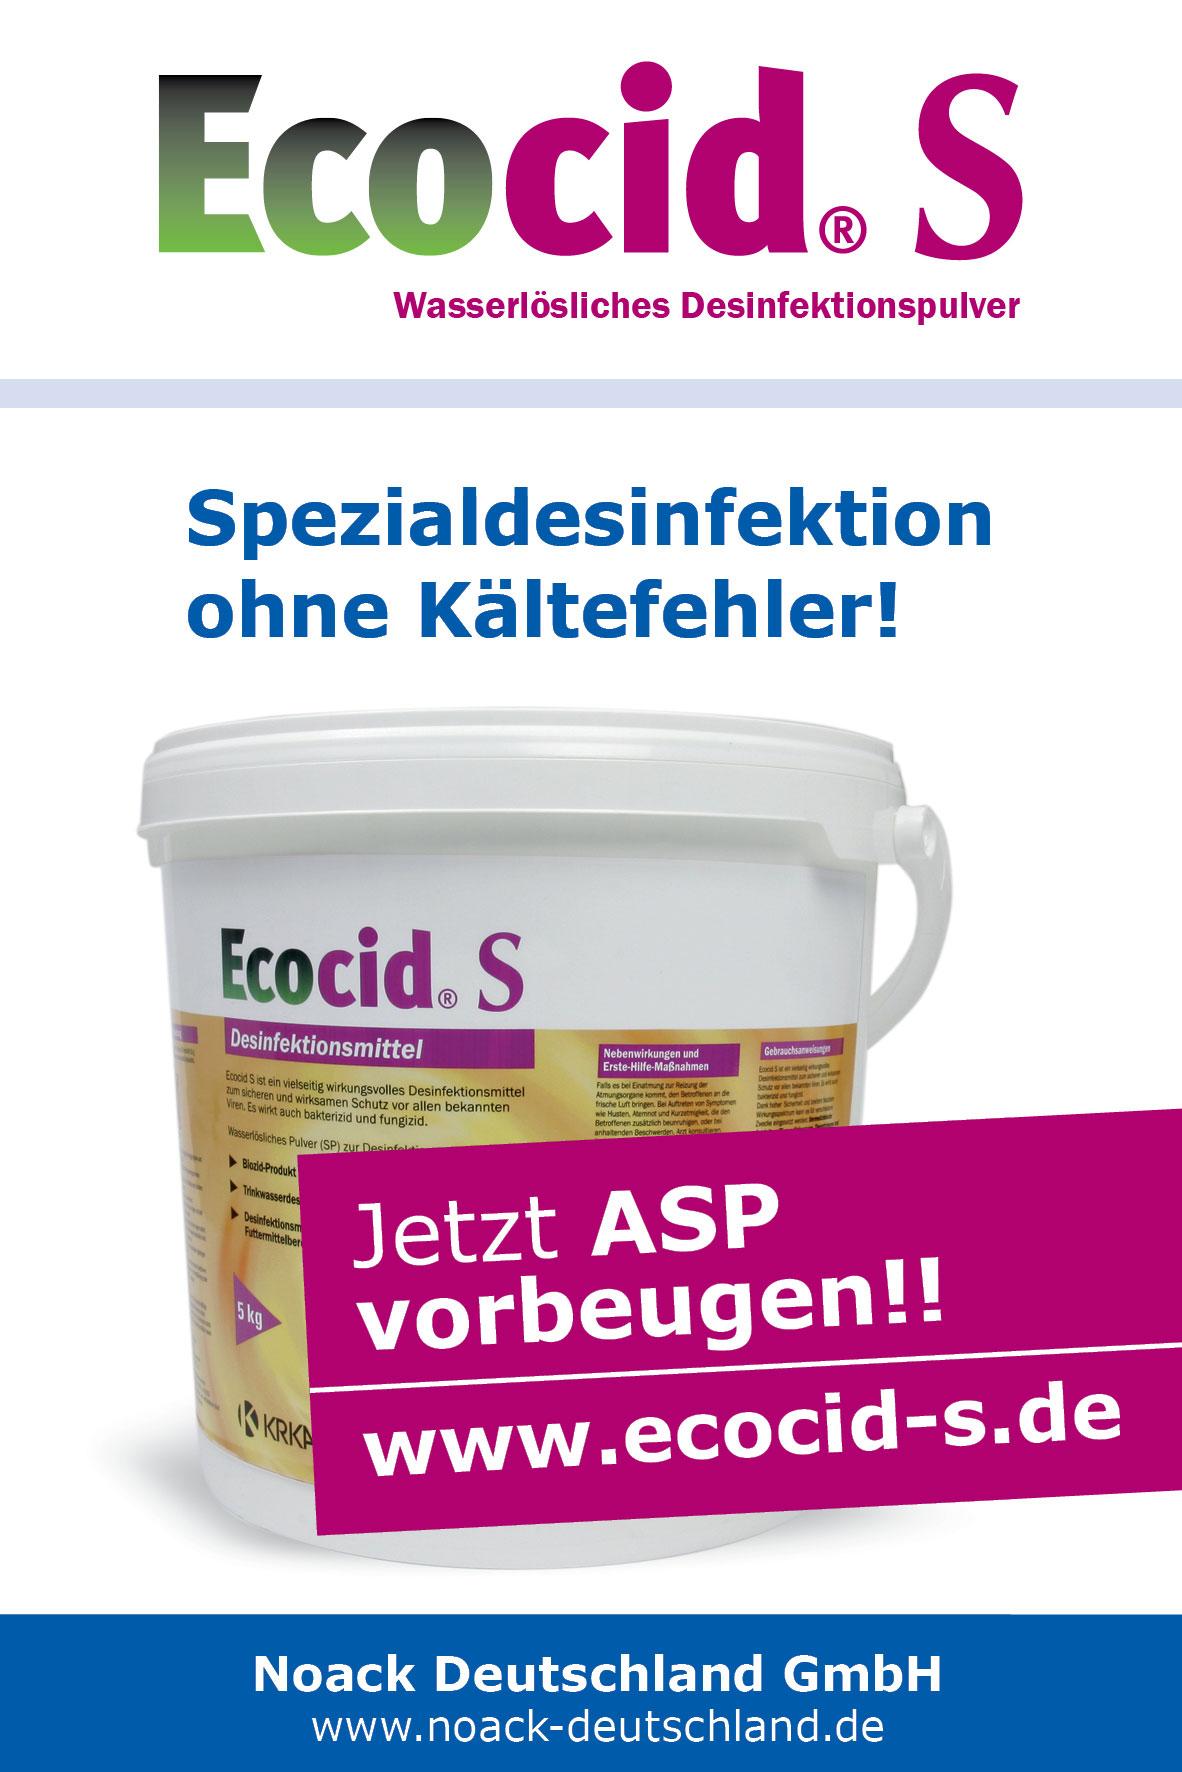 Pressebild Ecocid-S ASP 0214